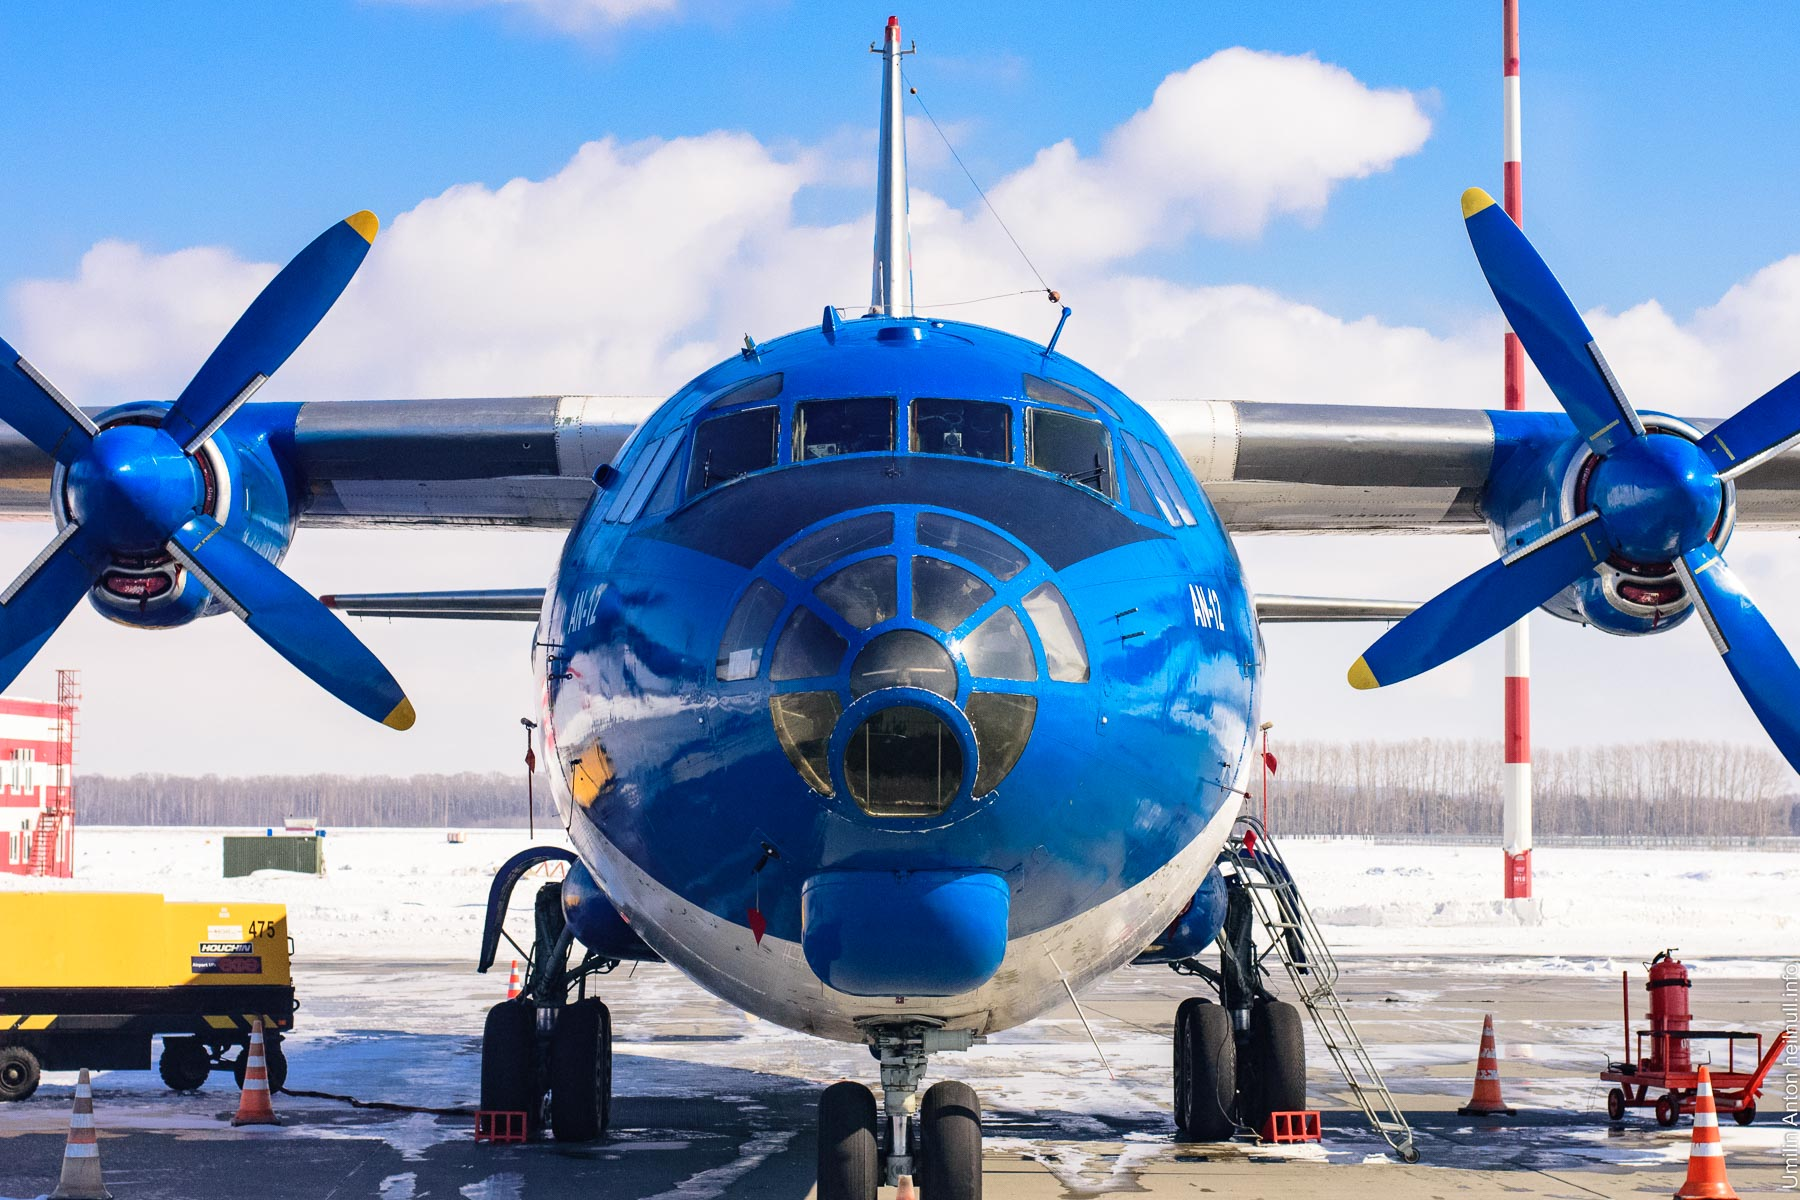 UAY_3339-3